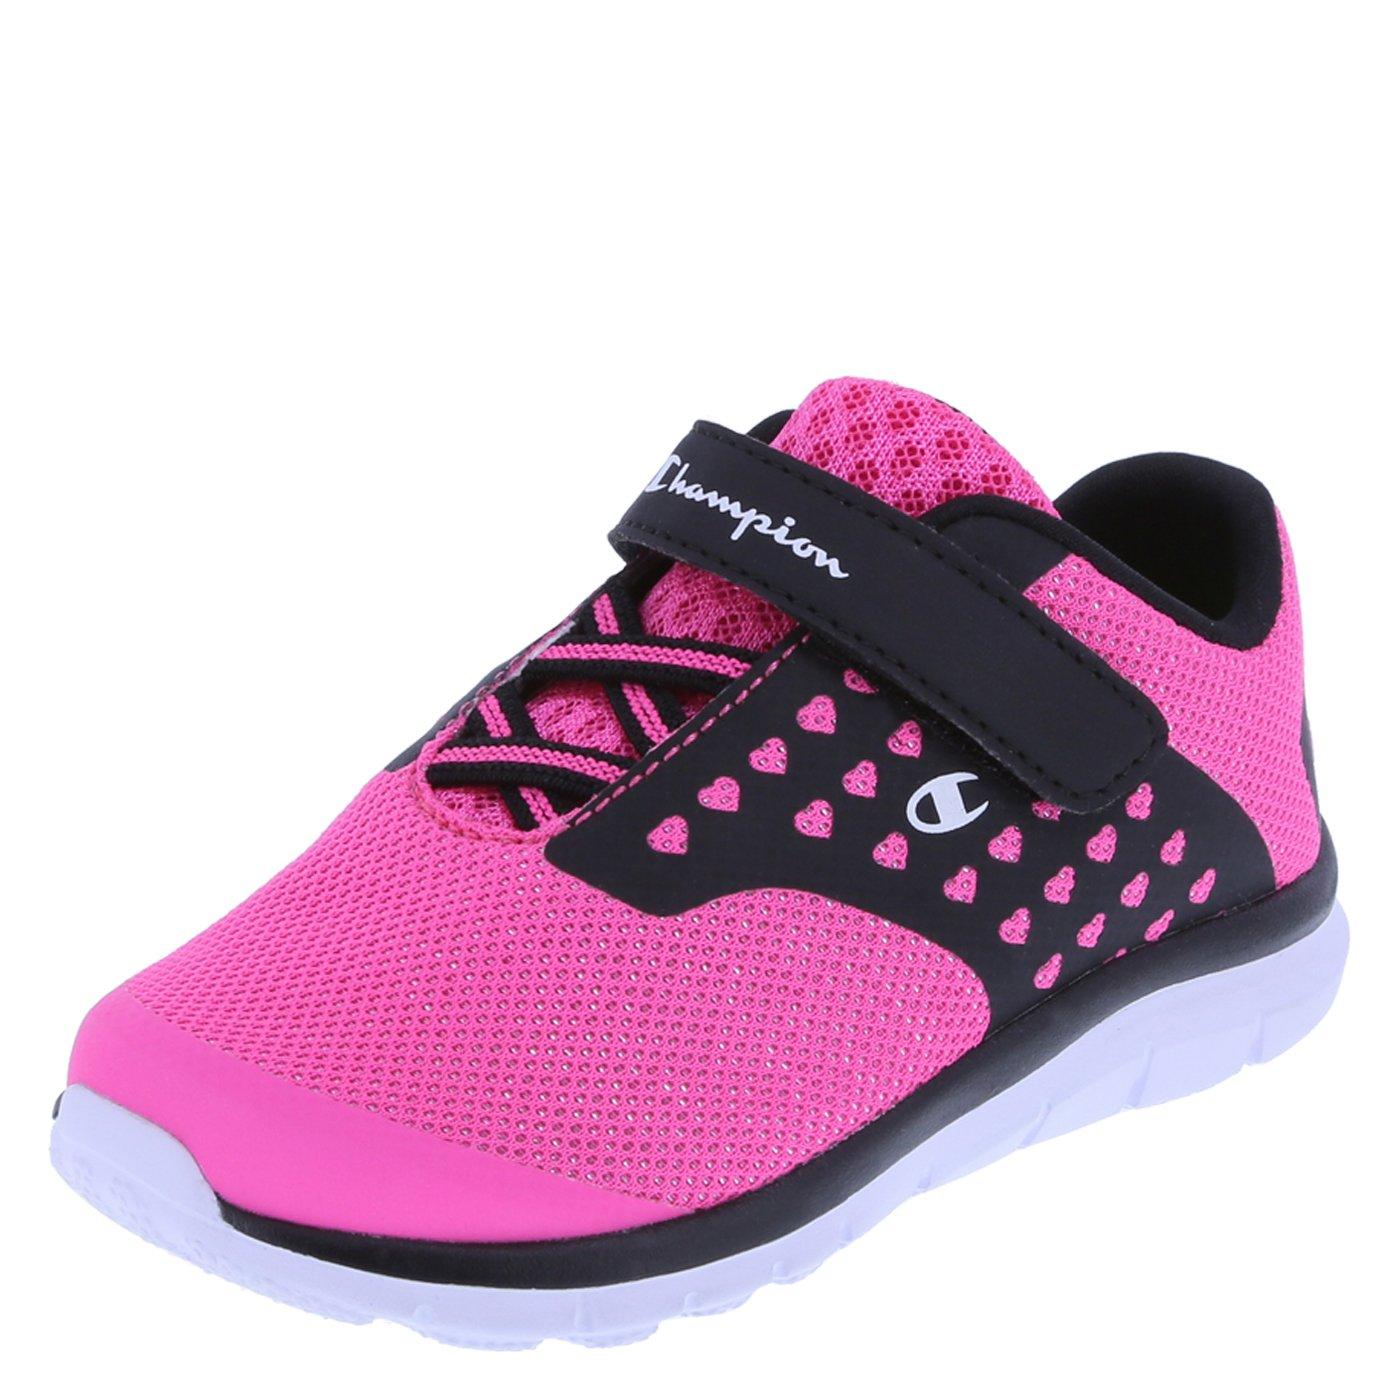 1ec46905bd34 Galleon - Champion Girls  Pink Black Heart Mesh Girls  Toddler Strap Gusto  Cross Trainer 7 Wide